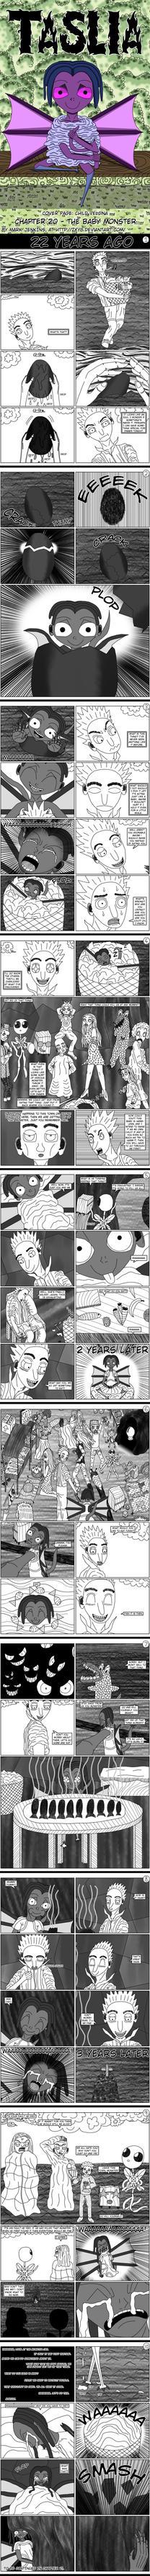 Taslia comic - Chapter 20, by ZXY8 by zxy8